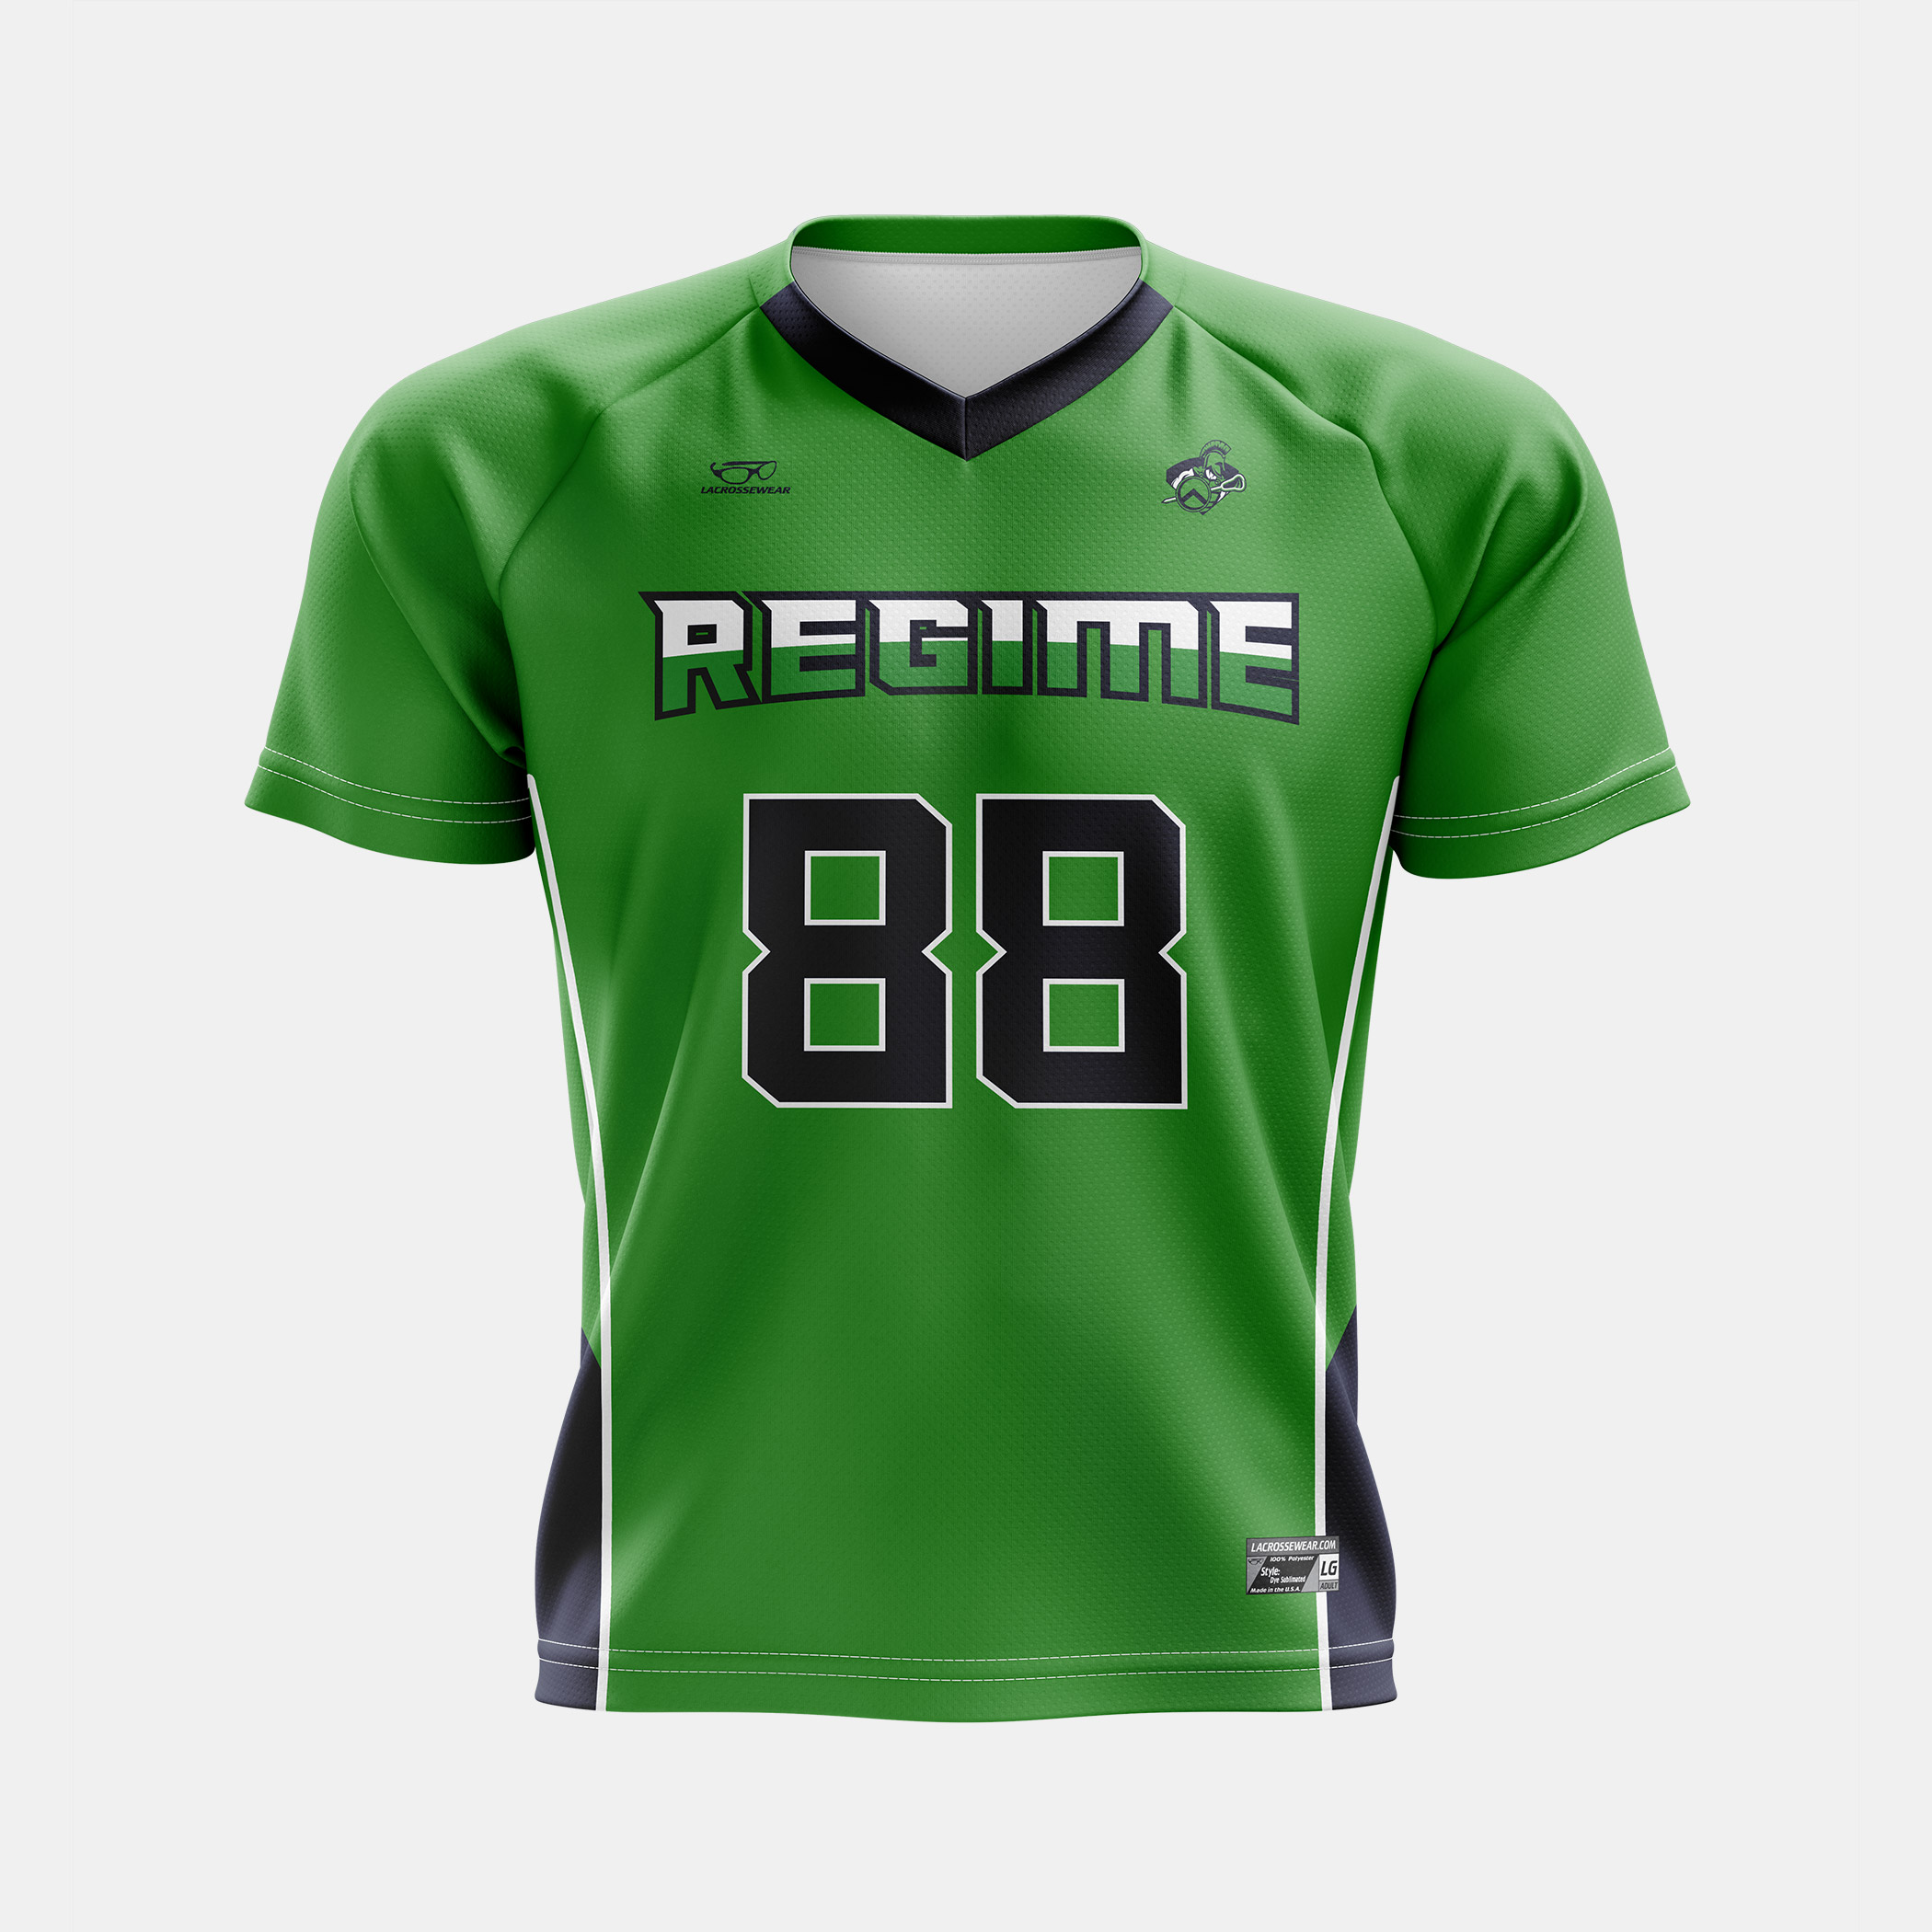 Regime Green Jersey